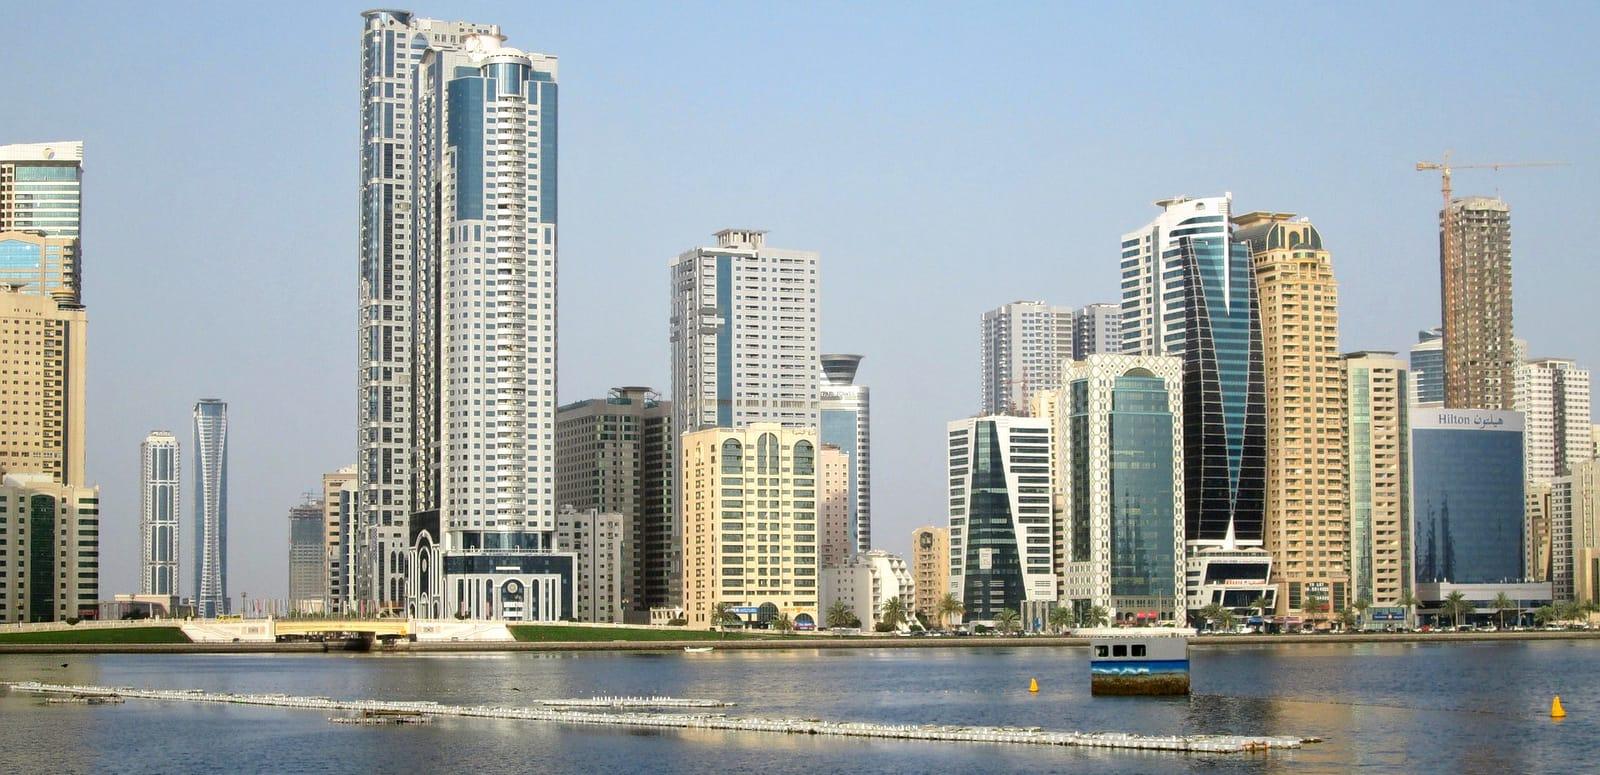 1493296181_united-arab-emirates-1126702_1920.jpg